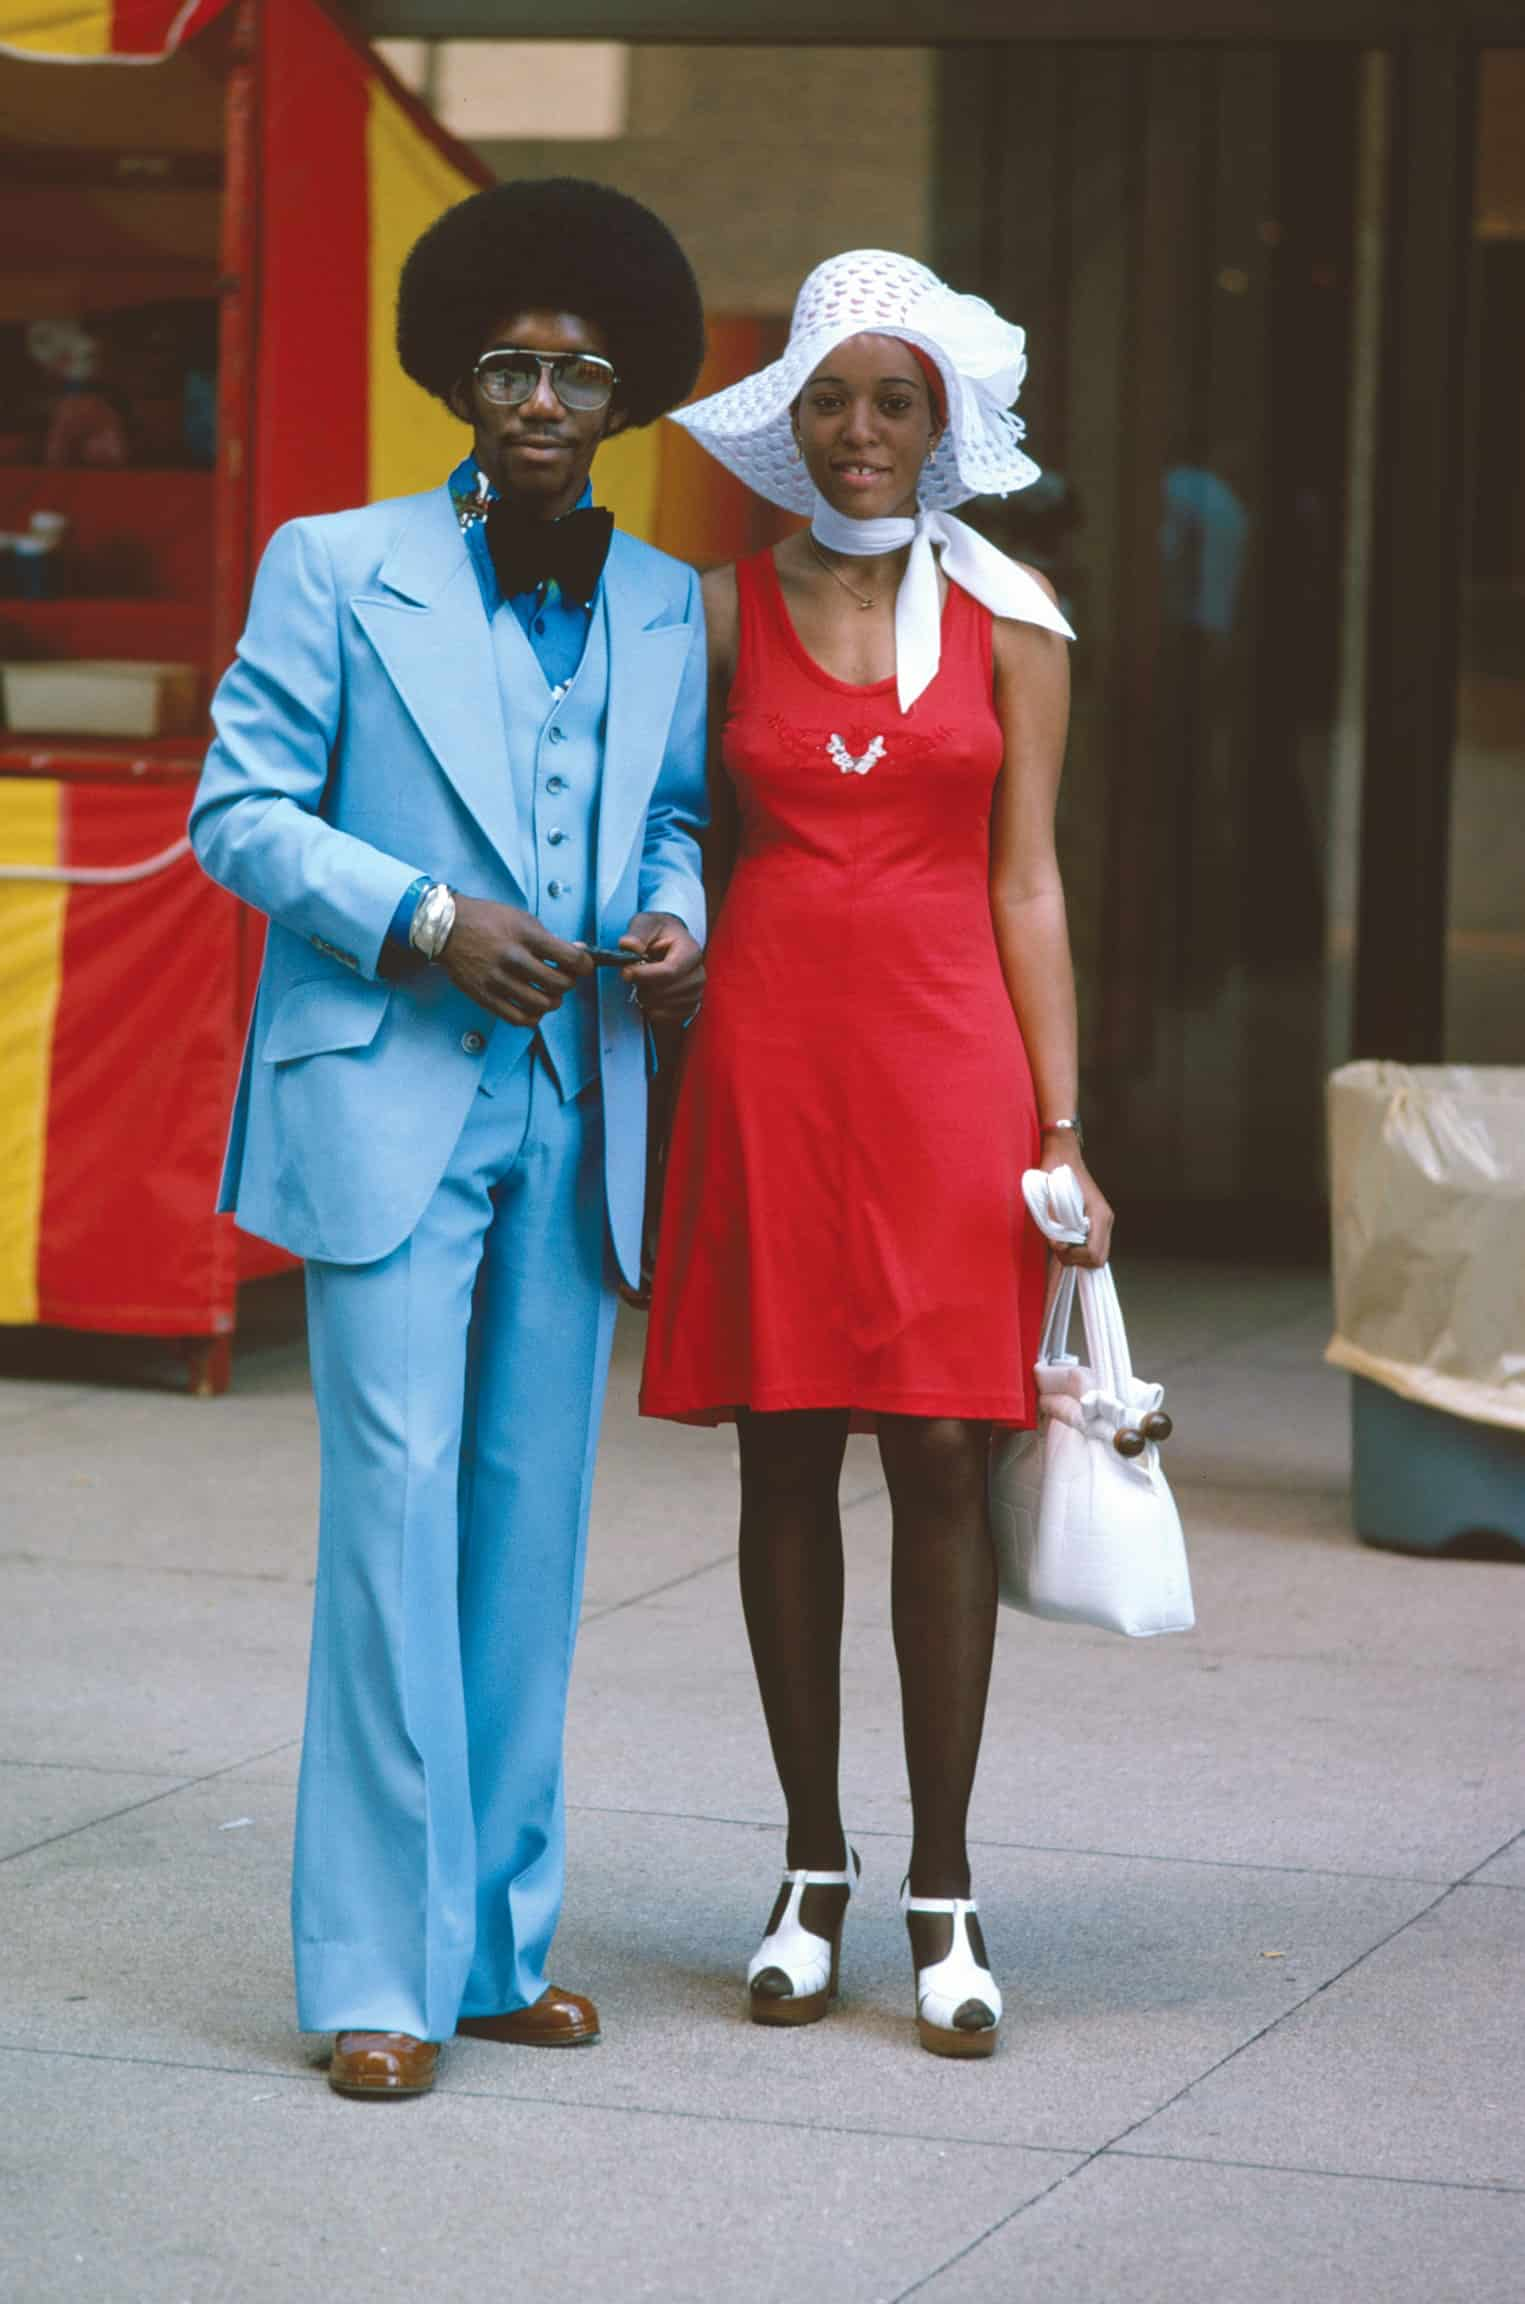 Men's Fashion in the 60's